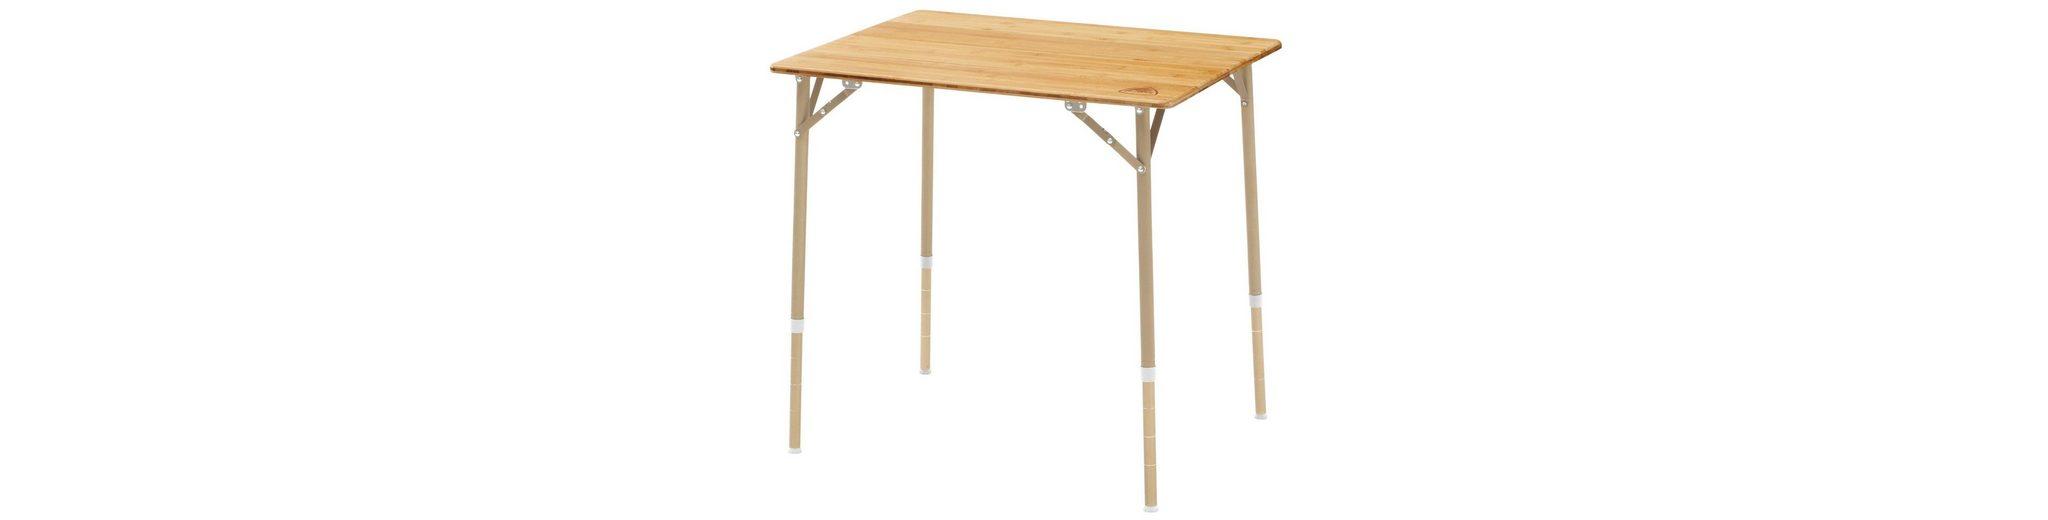 Robens Camping Tisch »Wayfarer Table Small«